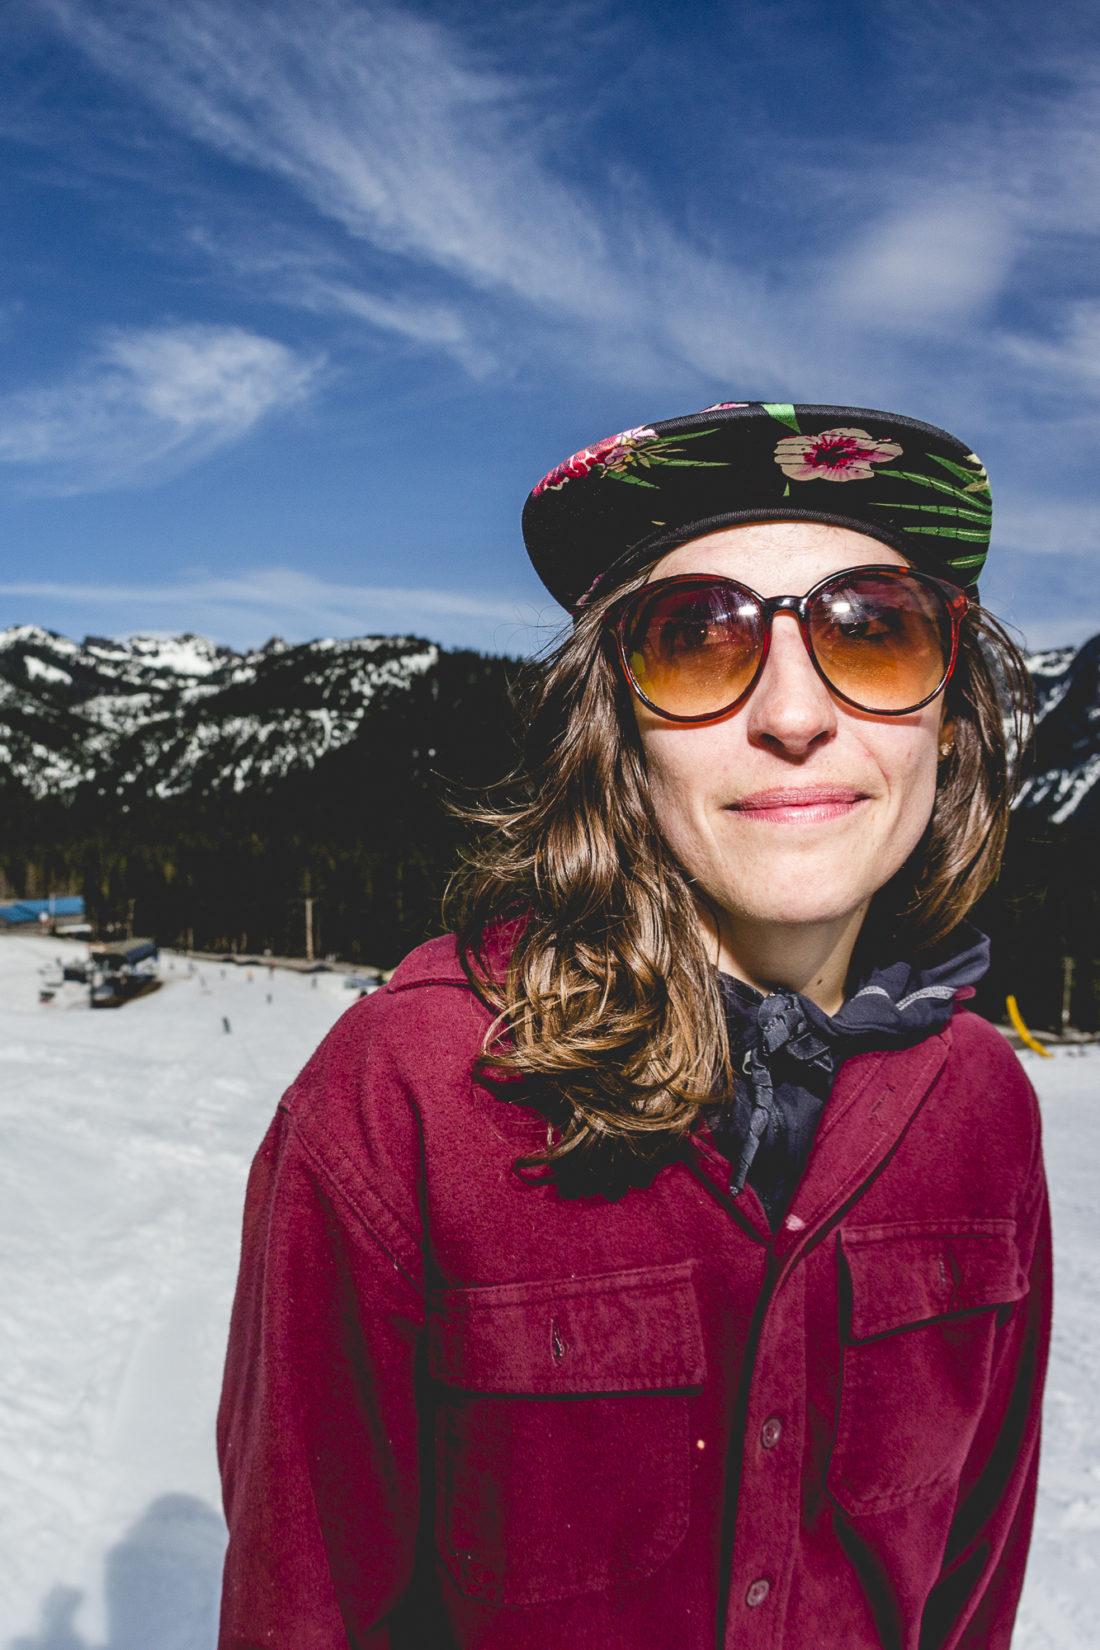 Ms. Erica Durtschi, professional corgi owner and skier